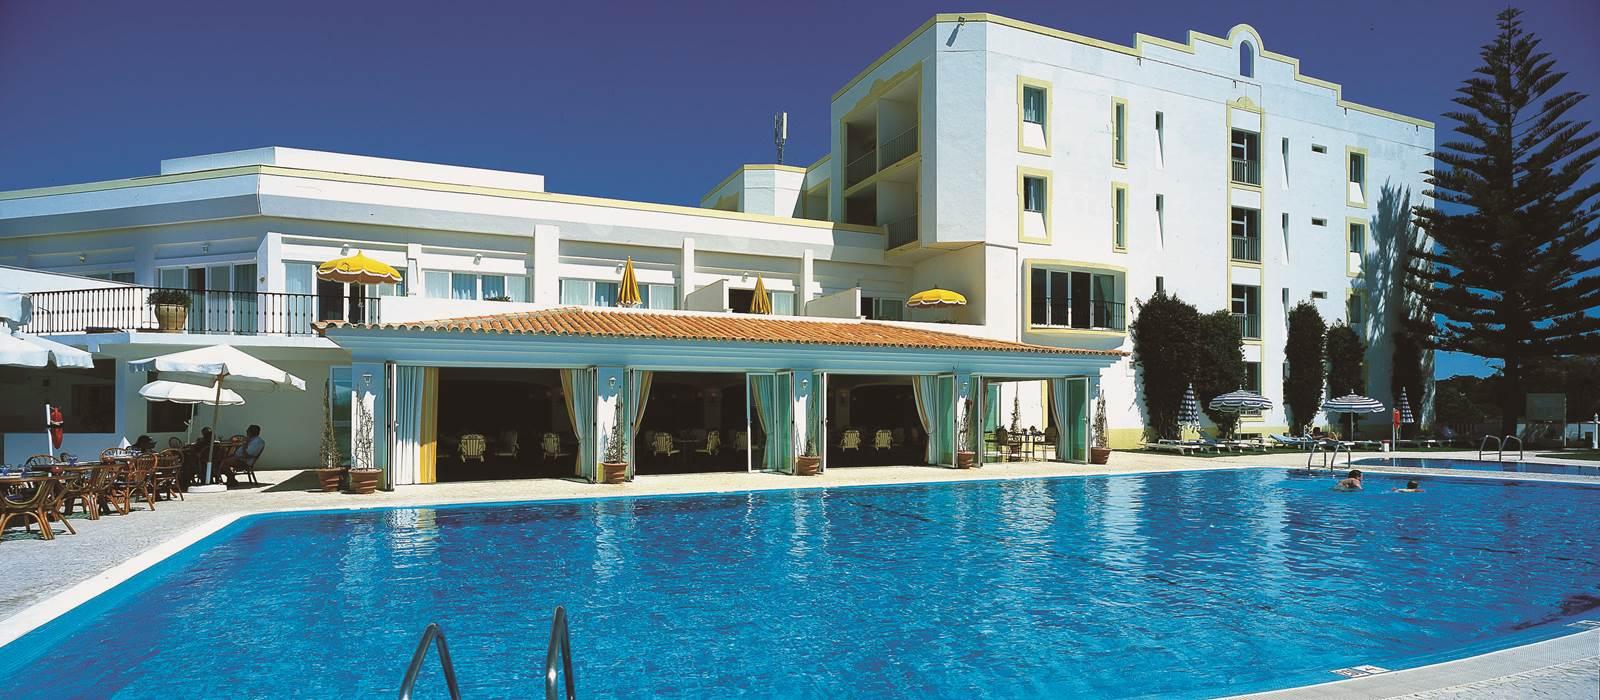 Heated Outdoor Swimming Pool Dona Filipa Hotel Algarve